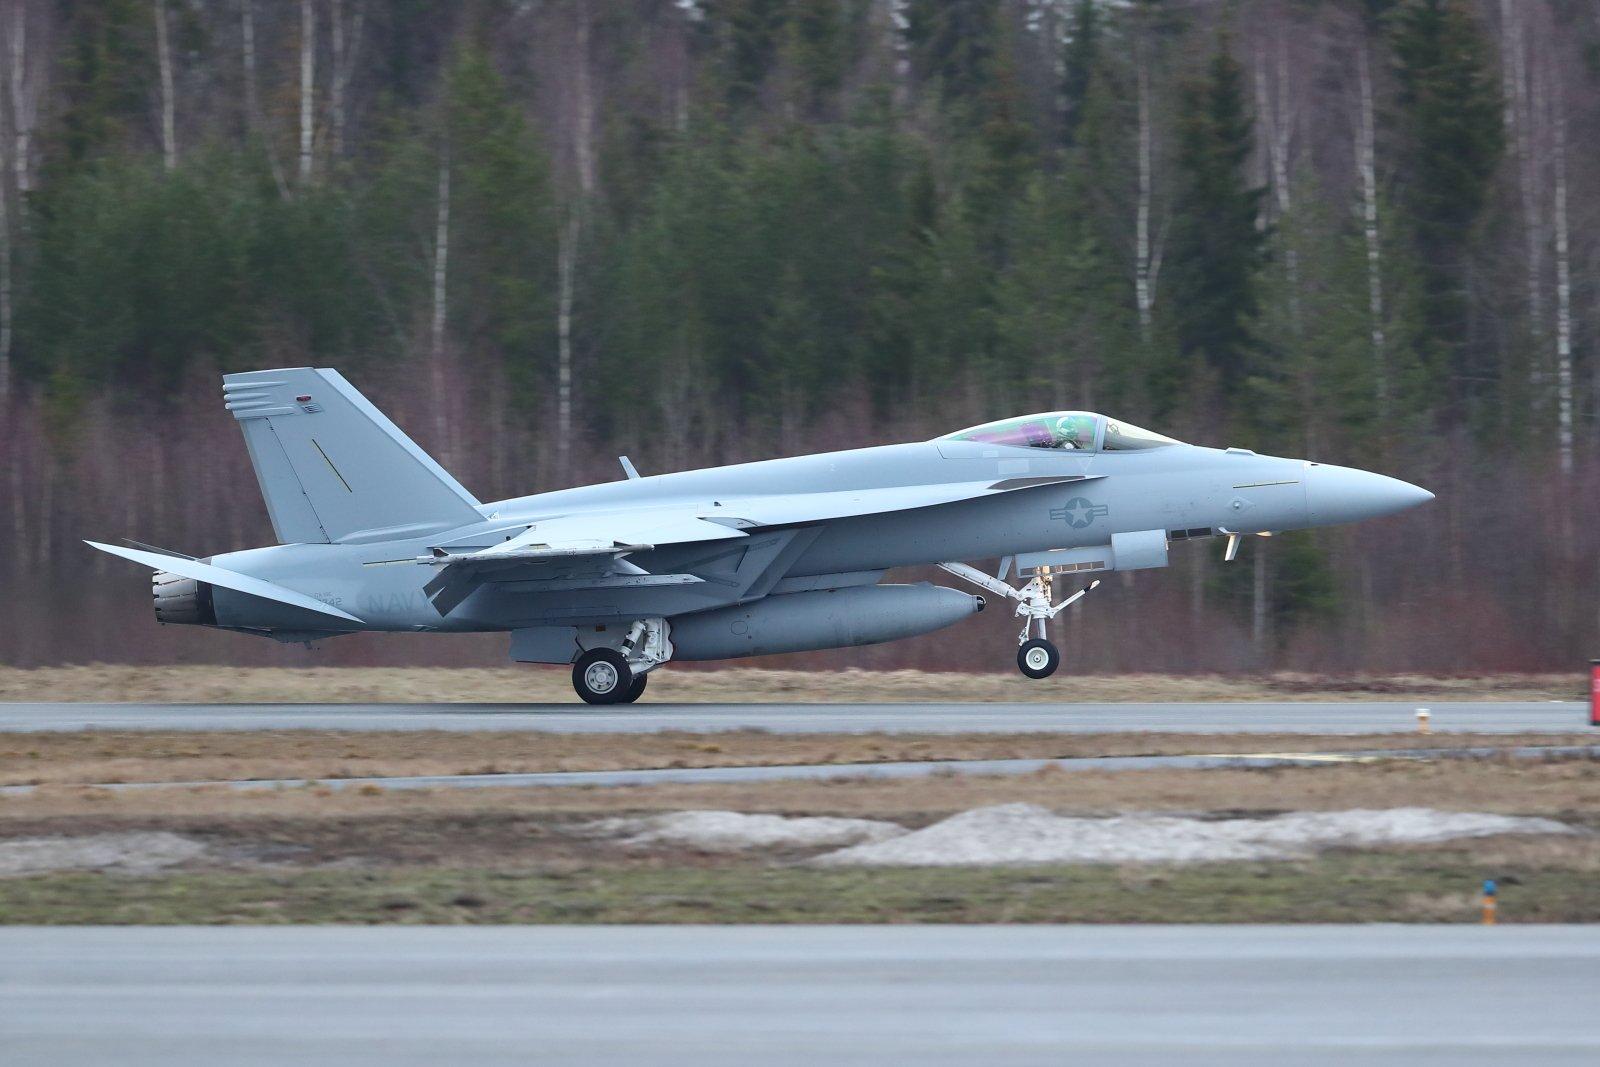 U.S.Navy Boeing F/A-18E Super Hornet 169742 EFTP 2020 02 18